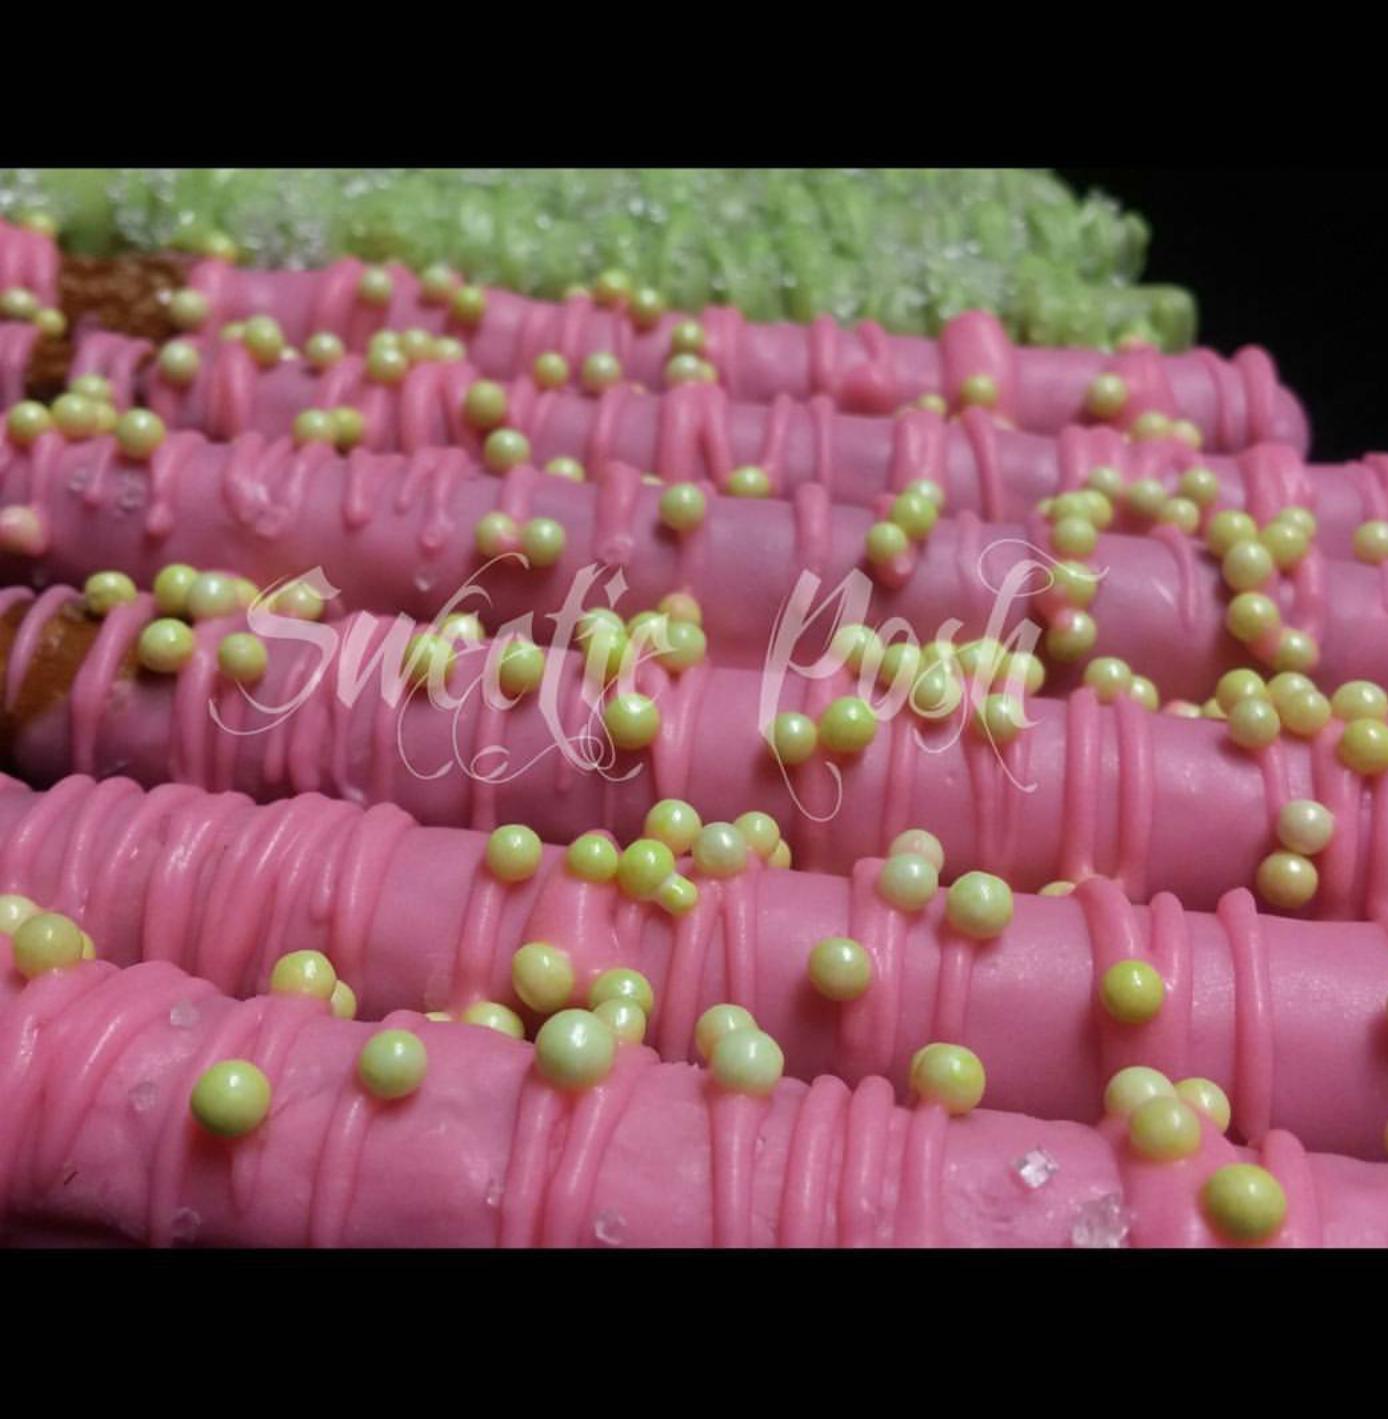 Sweetie Posh Desserts